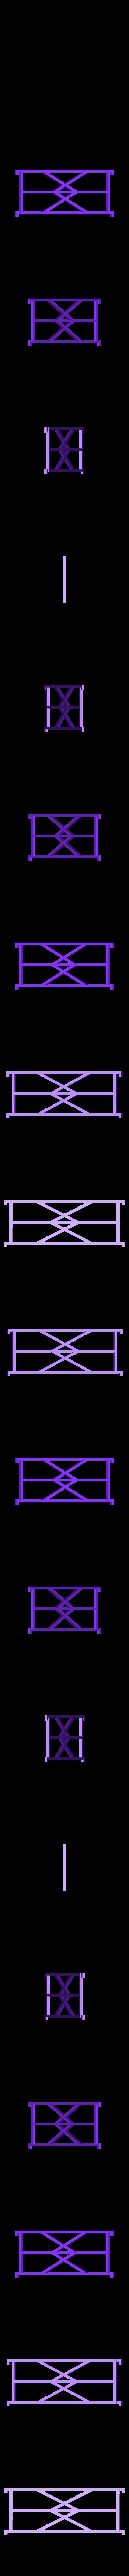 Tueten-Lager-separator.stl Download free STL file Customizable Compartment Skeleton Frame • 3D printing template, dede67